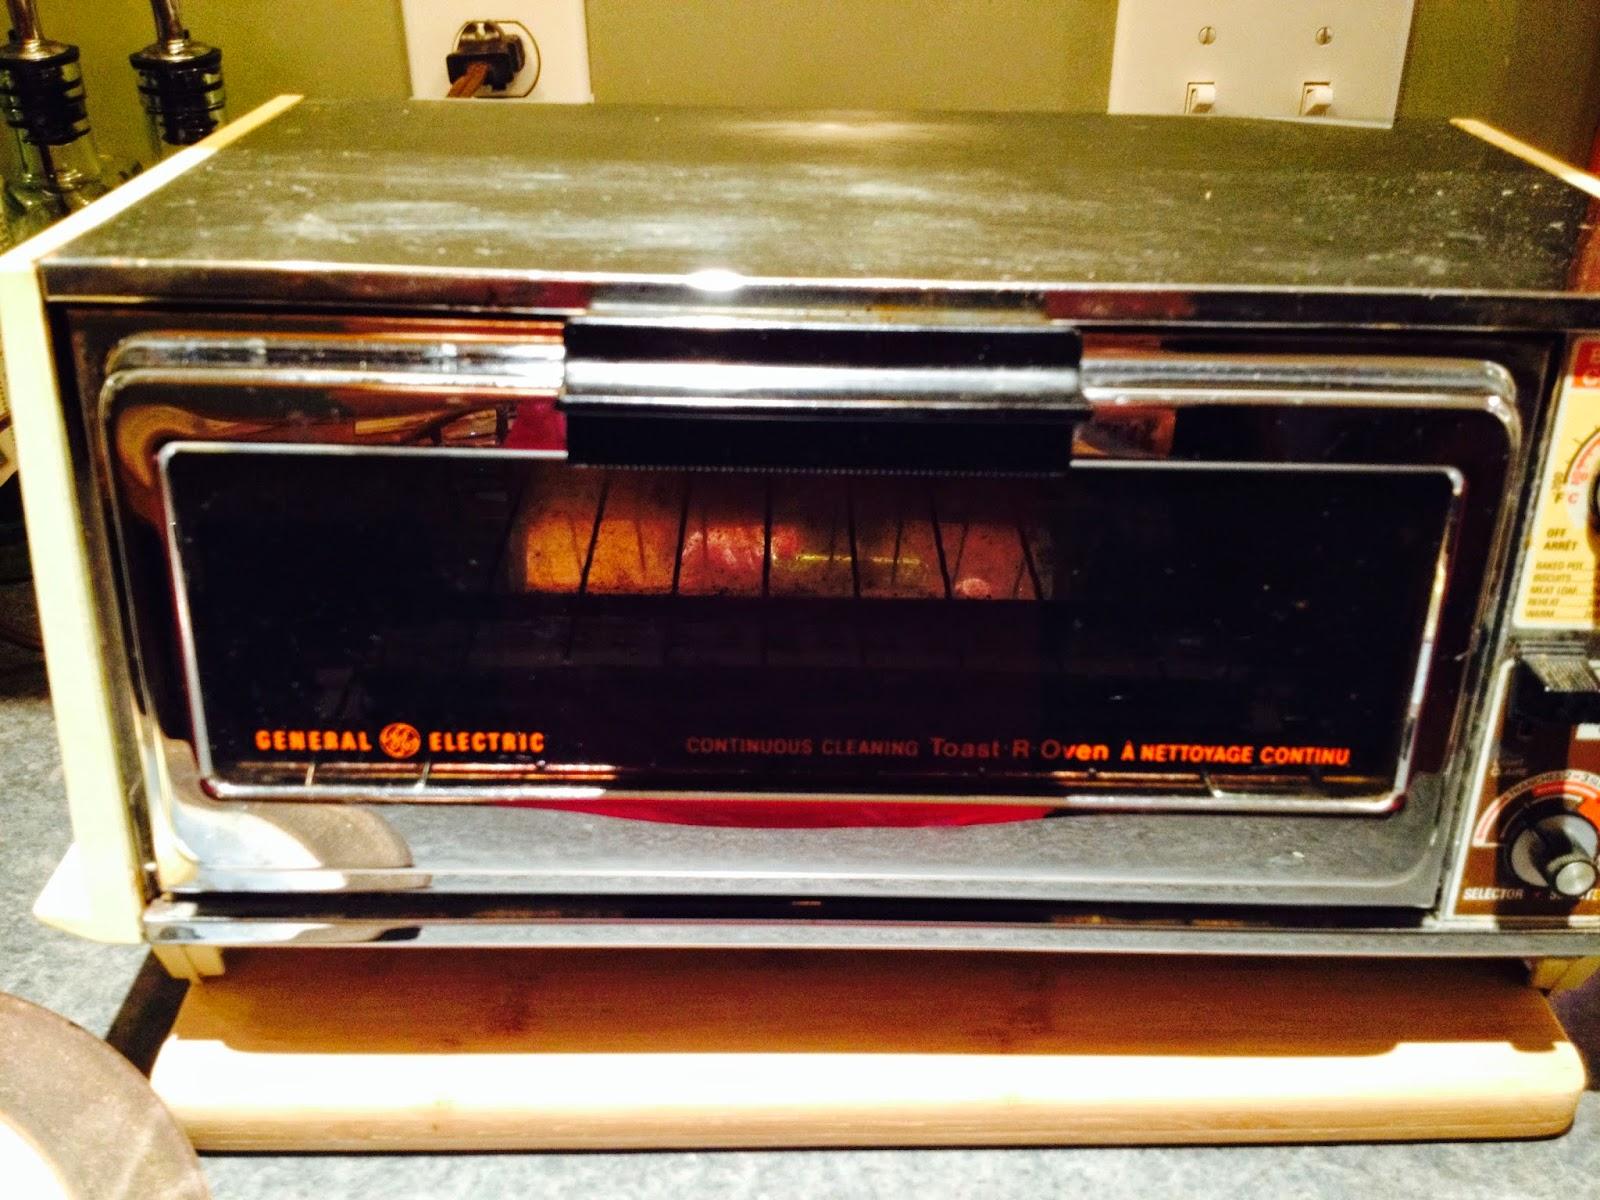 rhubarb roses toaster oven bread. Black Bedroom Furniture Sets. Home Design Ideas